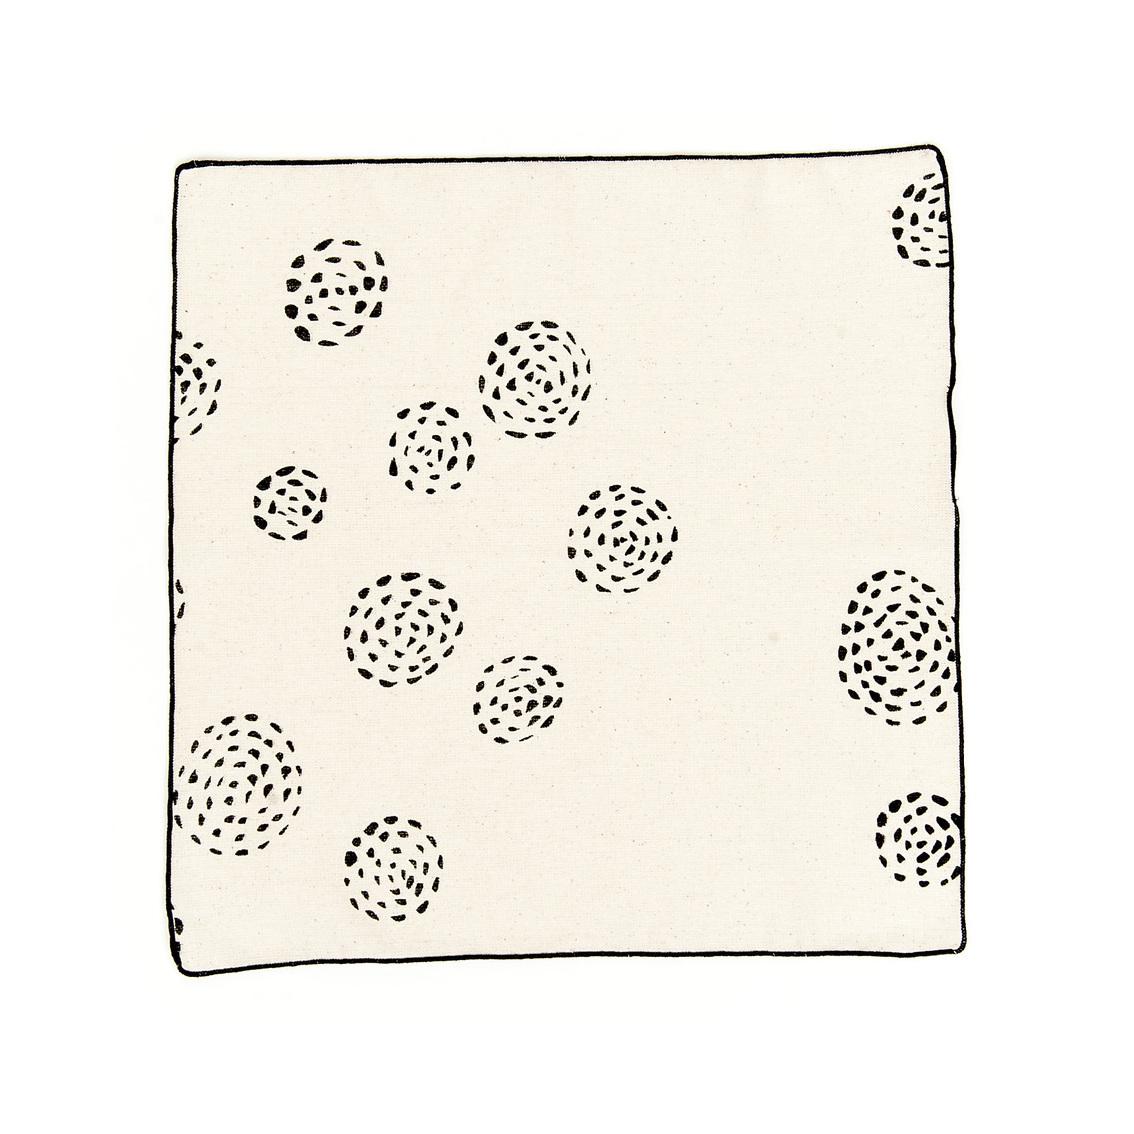 Artisan, Eco-Friendly, Designer Blooming Dots Napkin